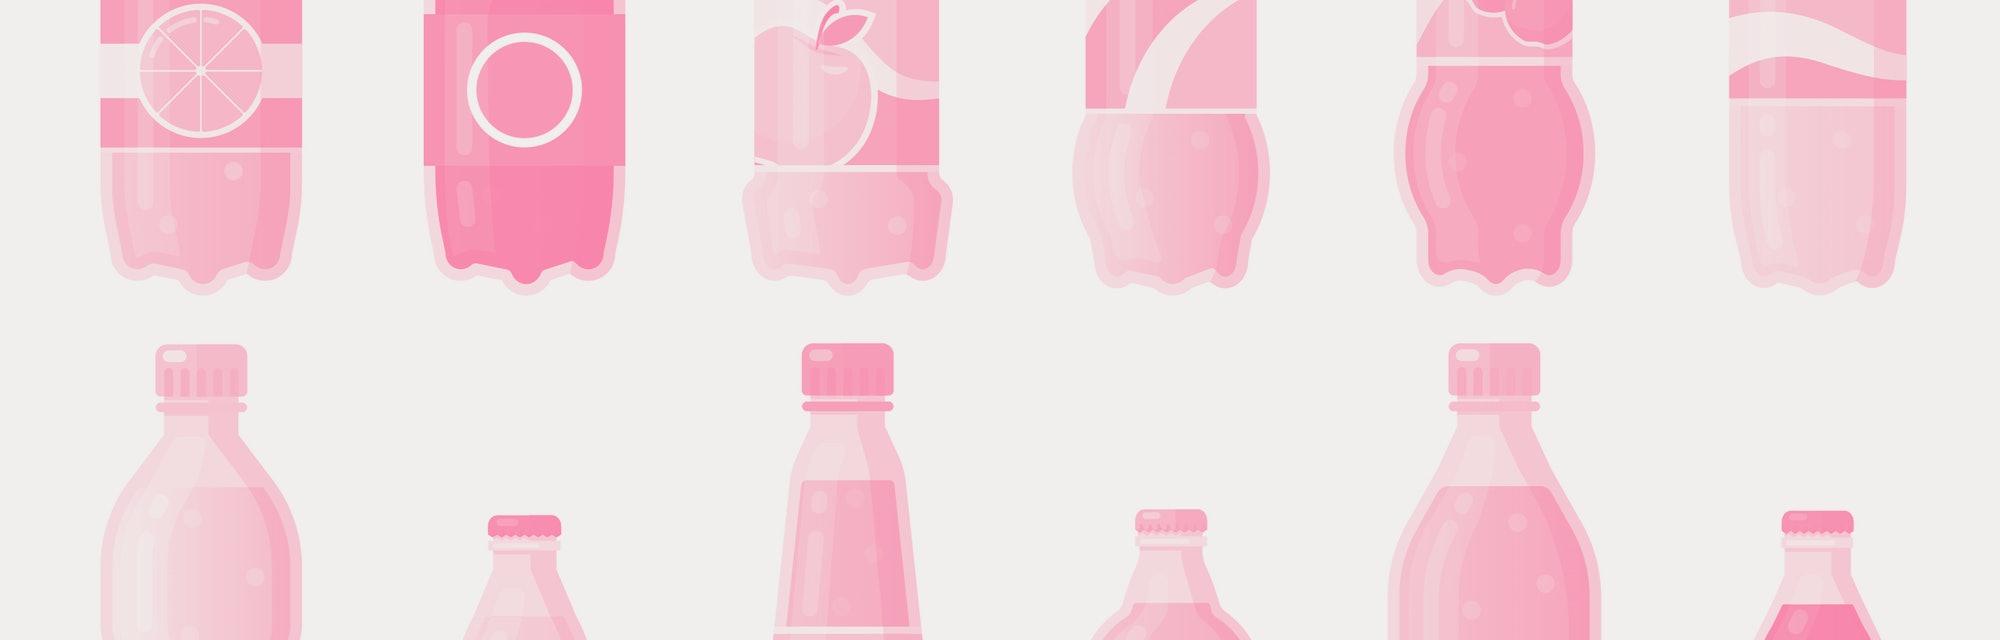 Soda drink bottles. Soft drinks in plastic bottle, sparkling soda and juice drink. Fizzy beverages isolated vector illustration icons set. Beverage drink bottle, water soda juice collection